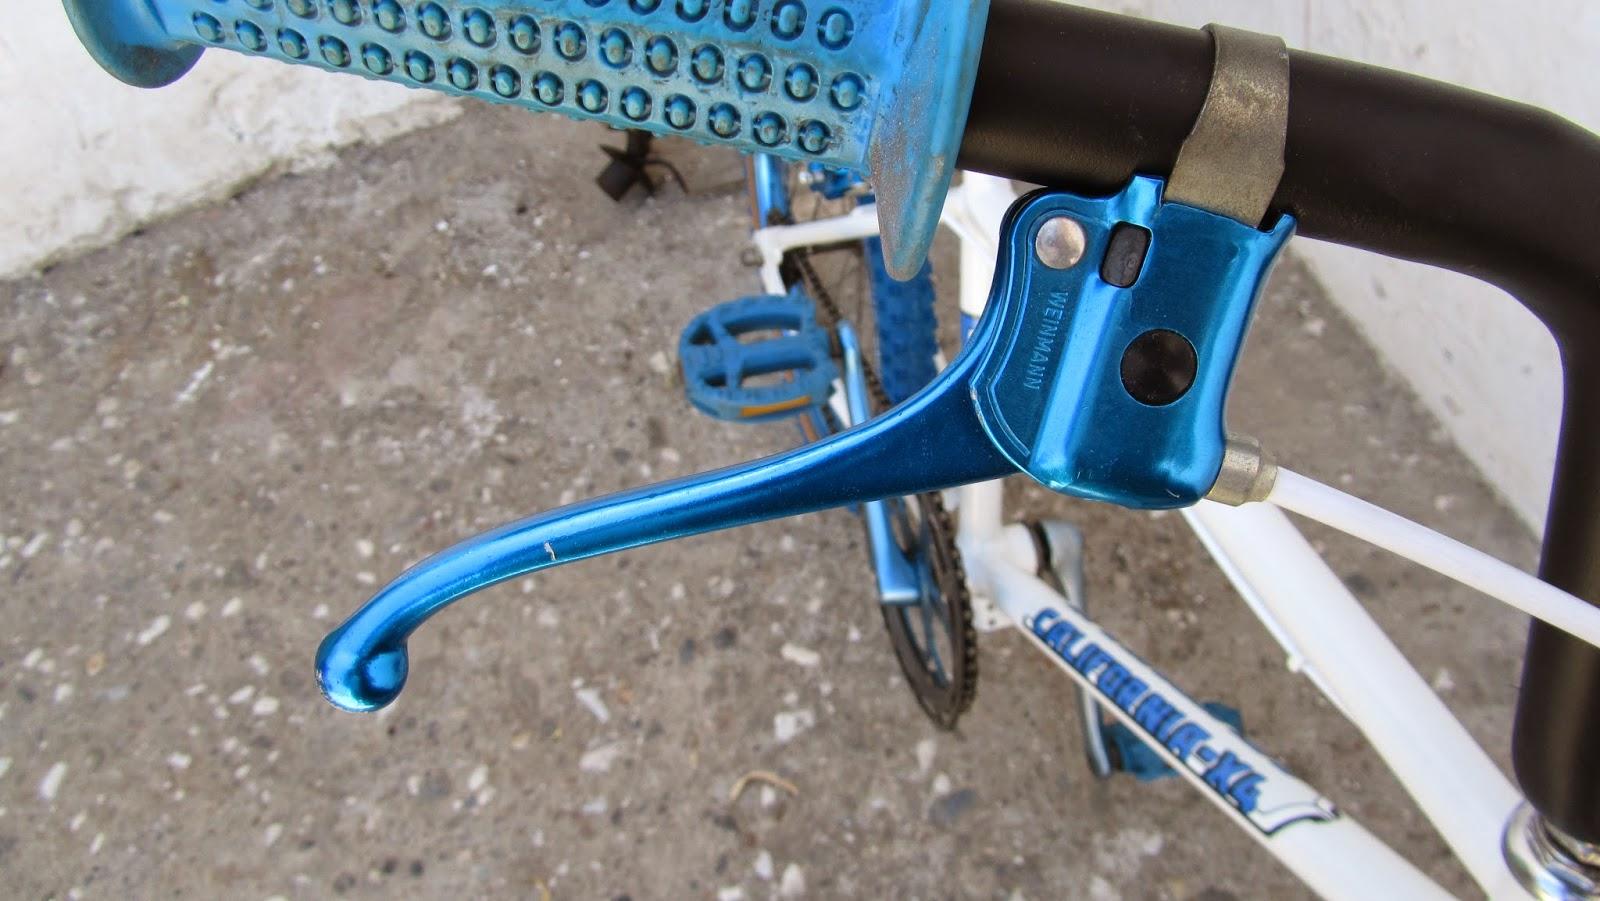 maneta de freno weinnman azul